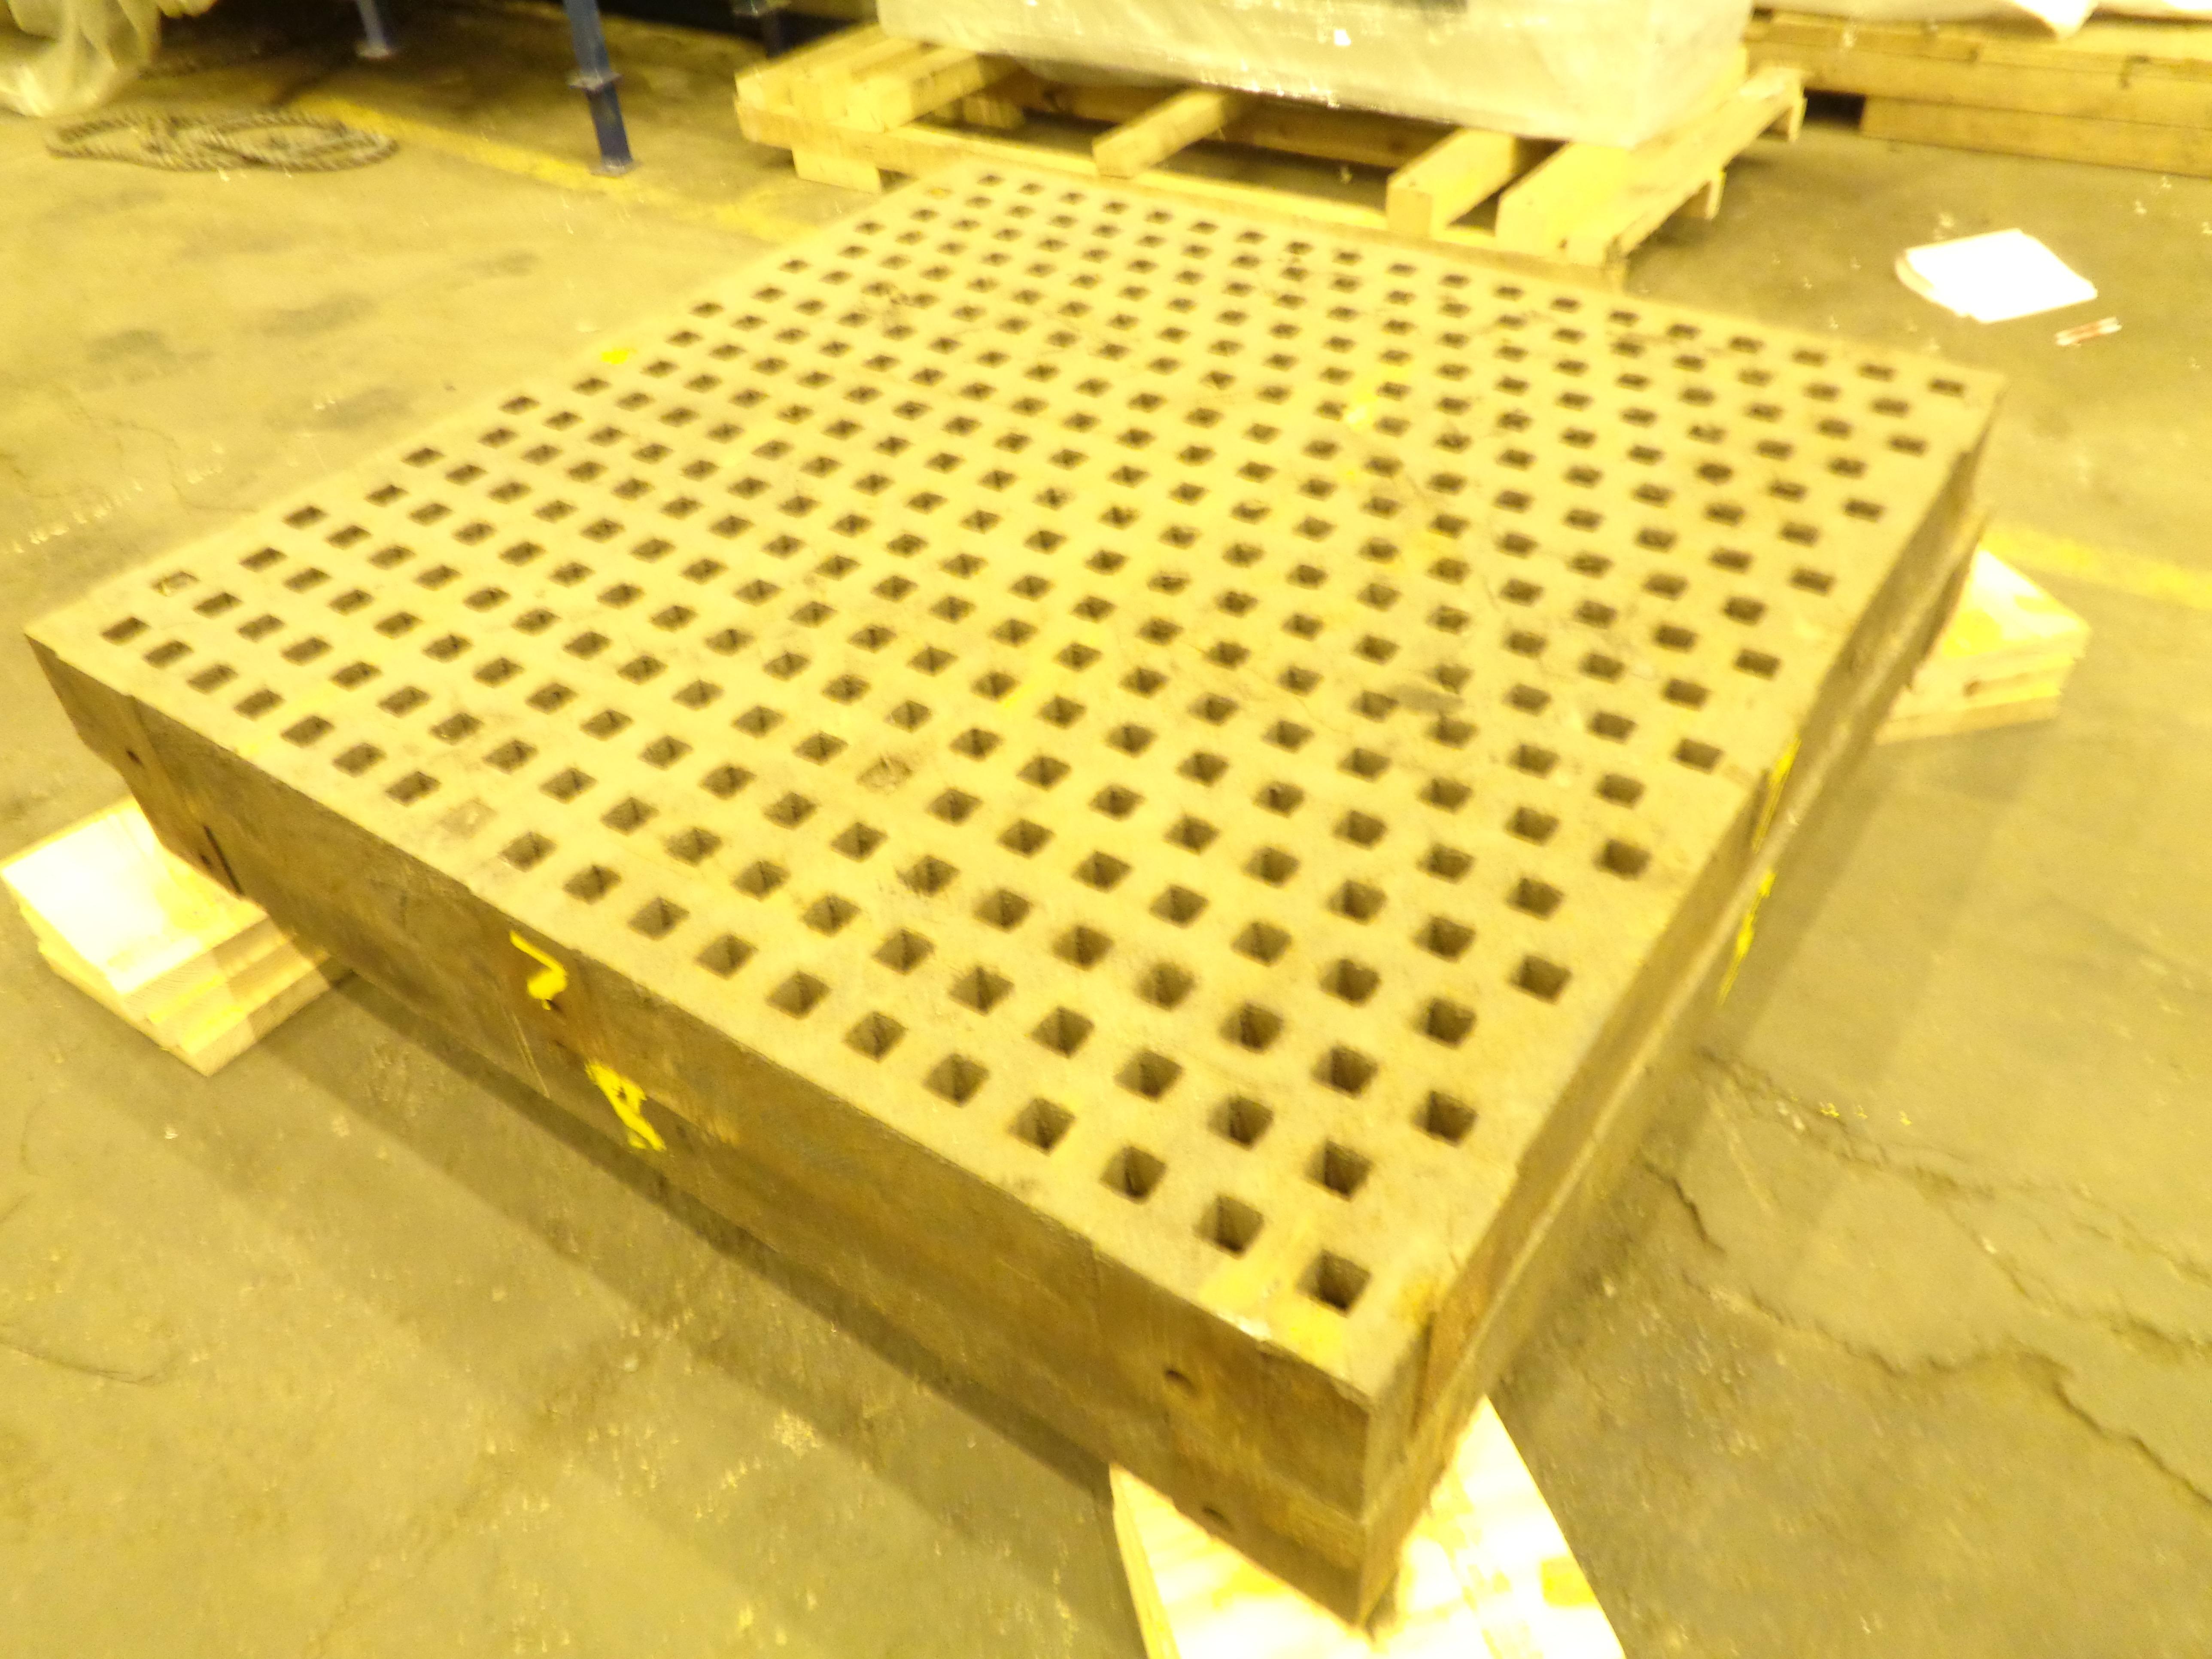 Lot 24 - Acorn Welding Table #7